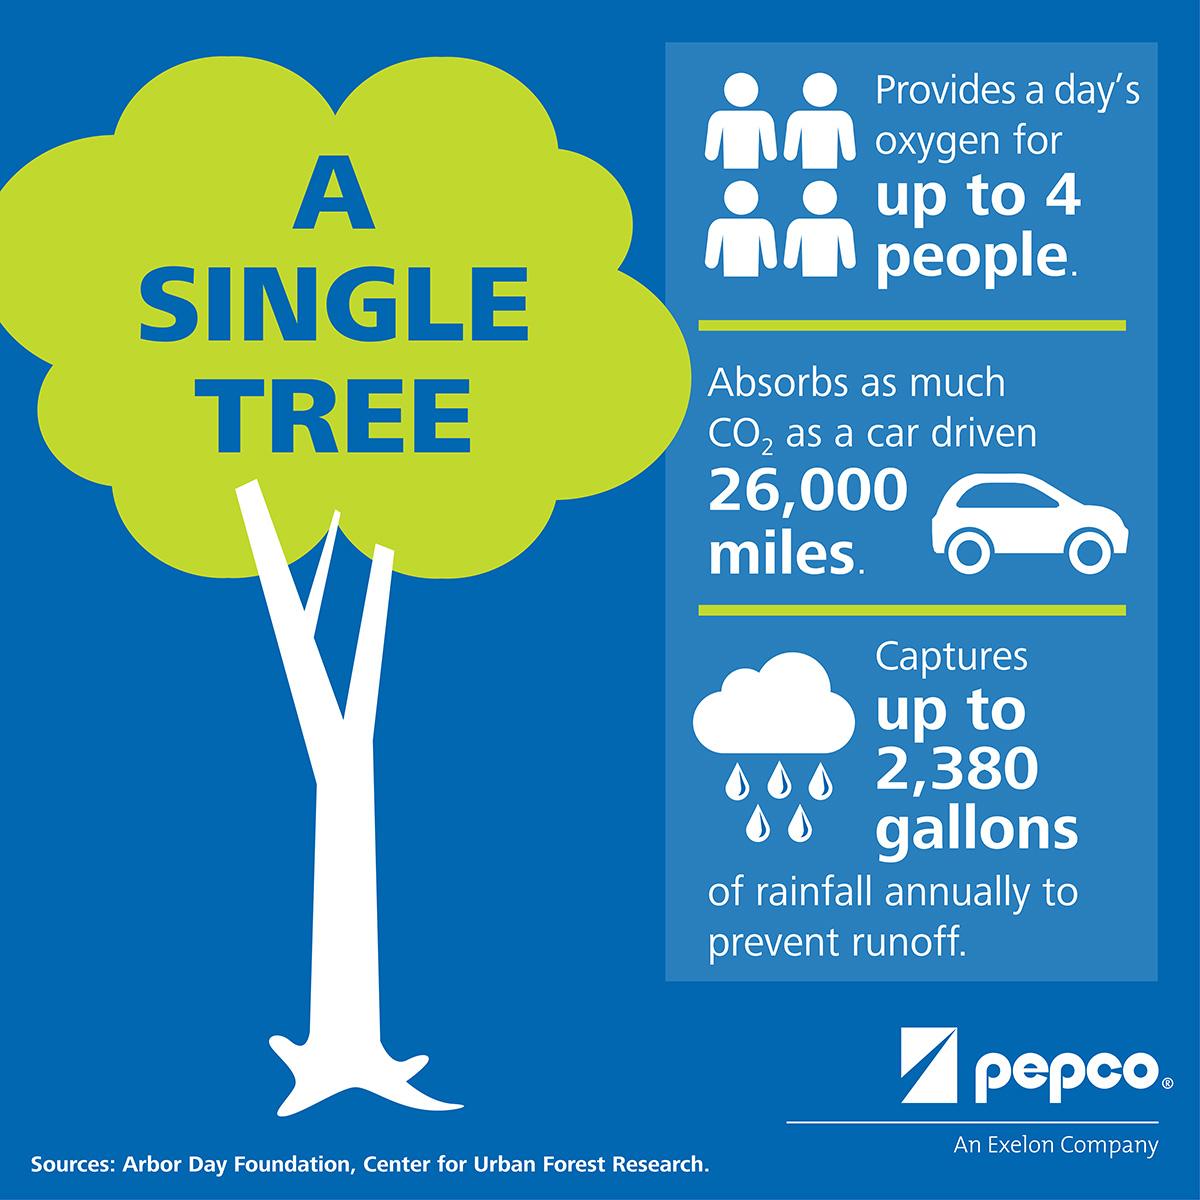 Pepco - Facebook Infographic